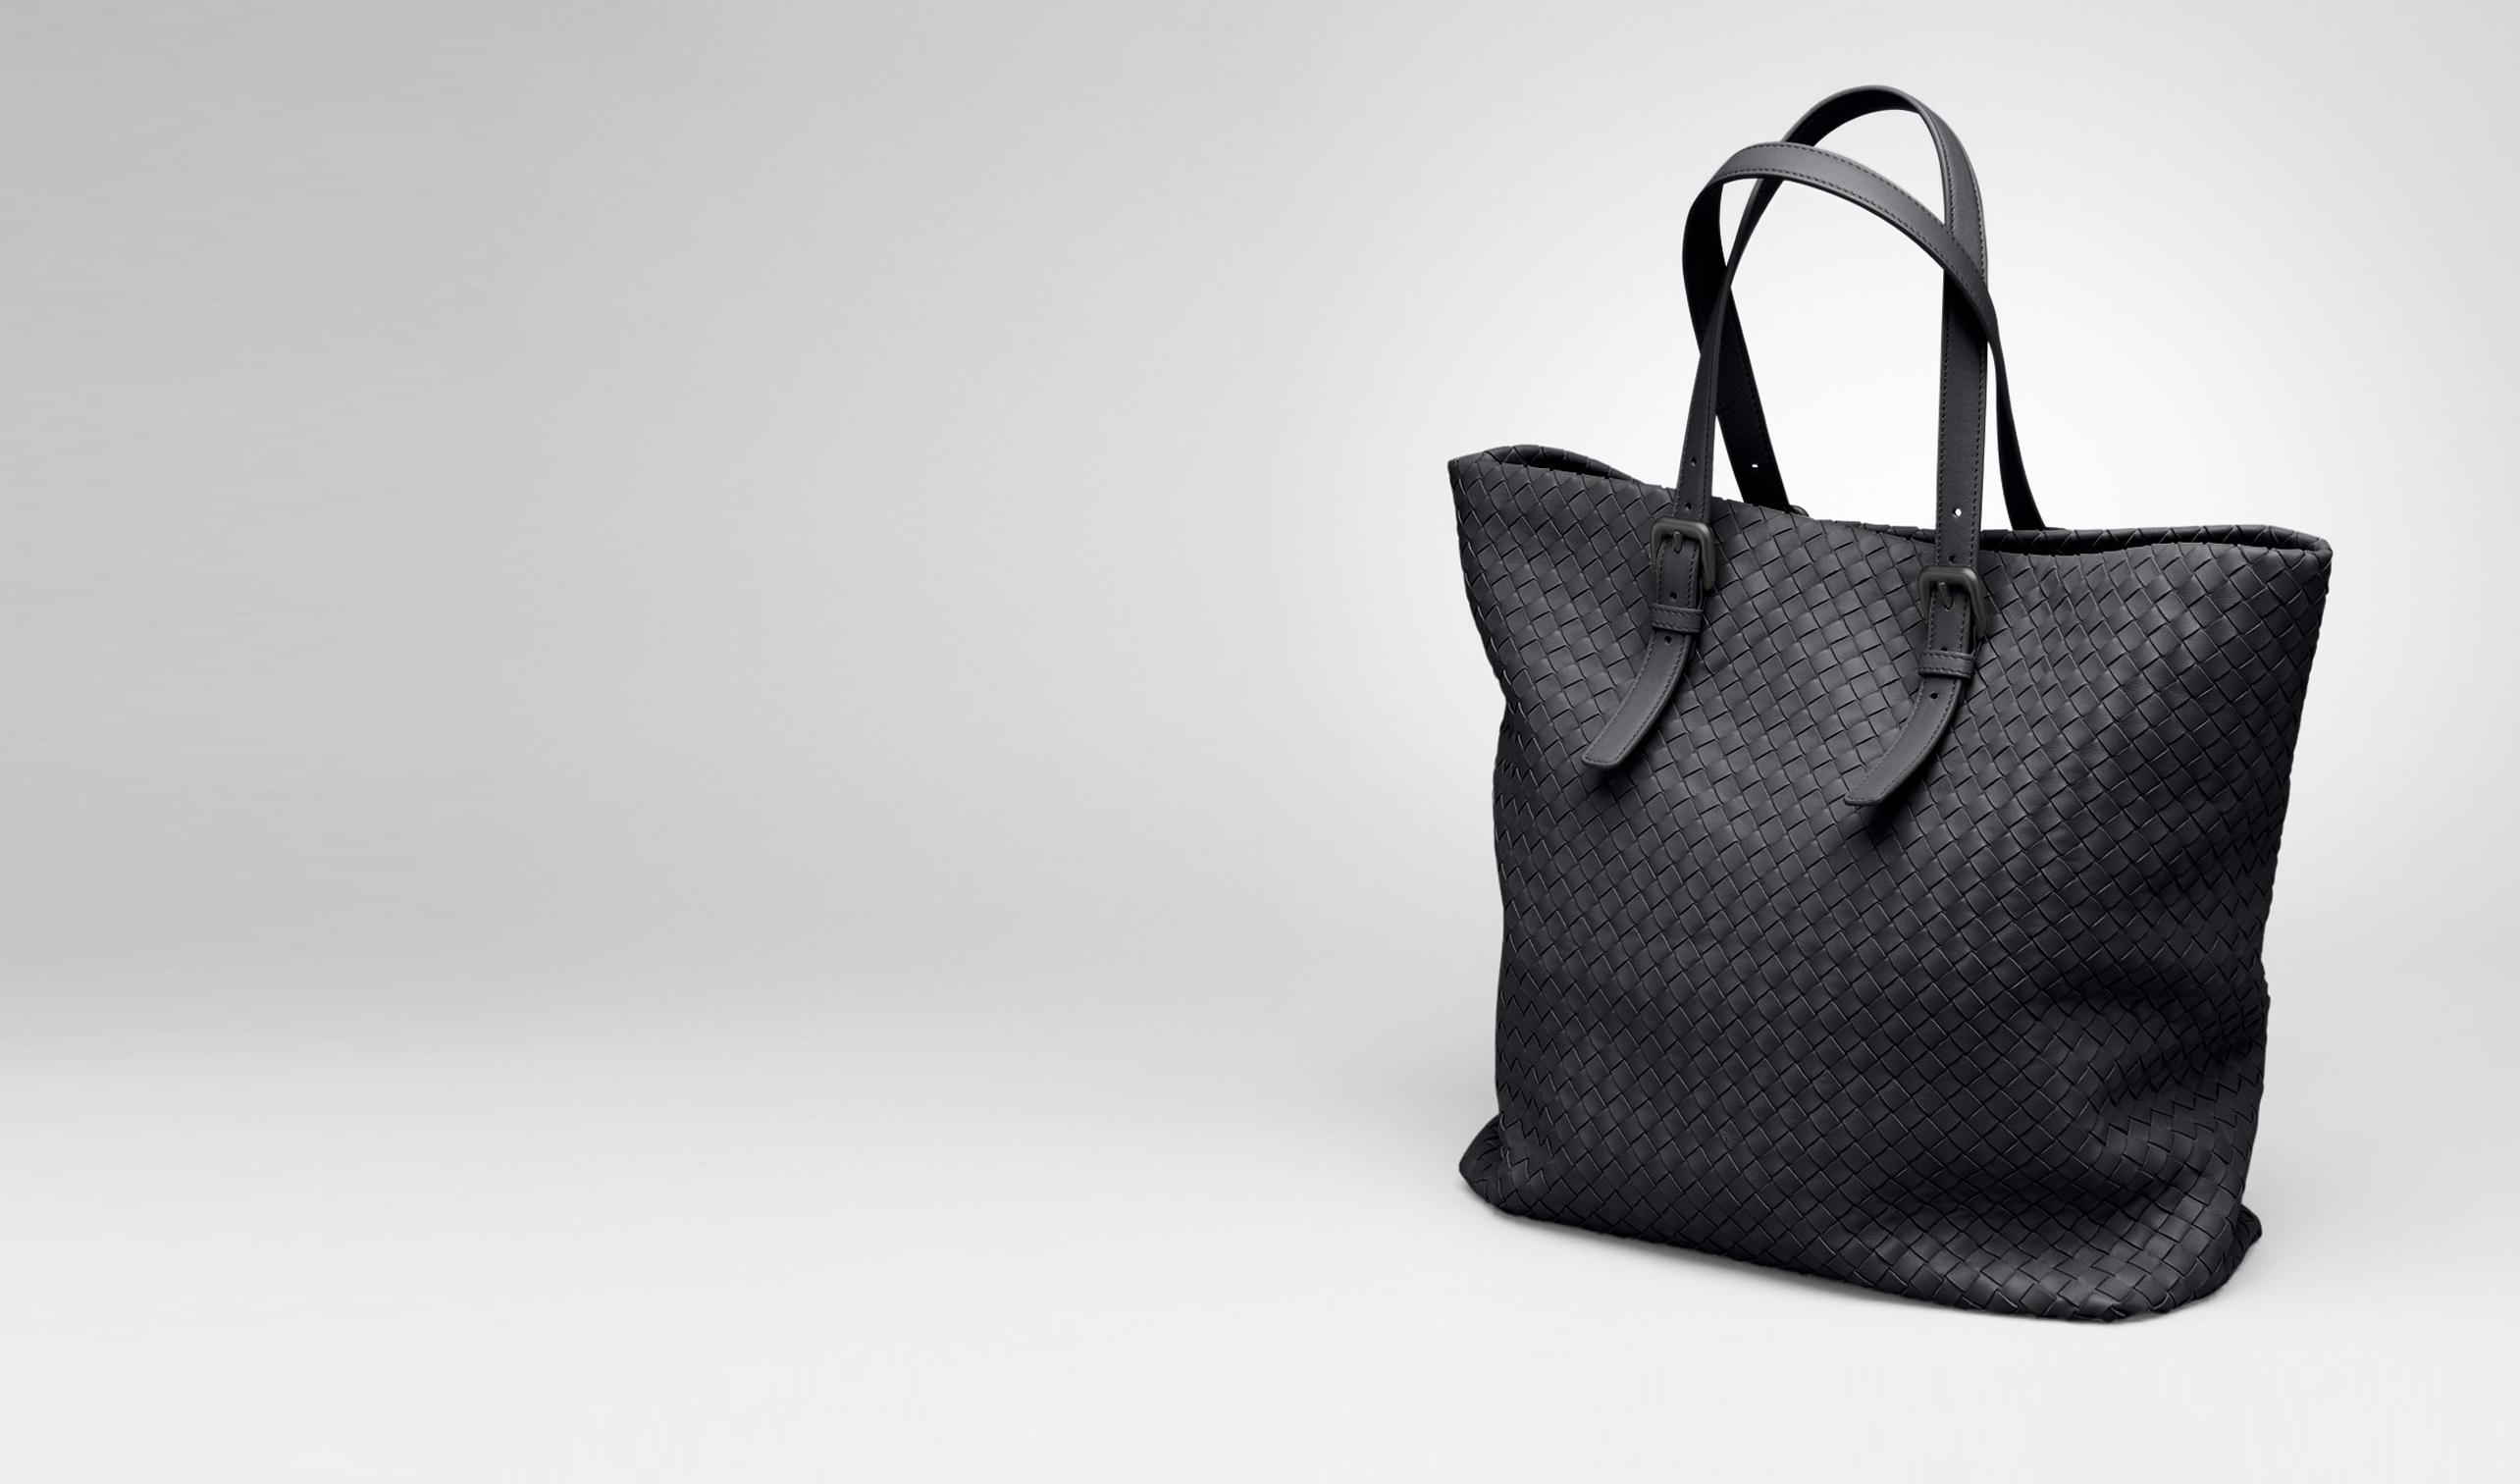 BOTTEGA VENETA Tote Bag D Nero Intrecciato Nappa Tote pl